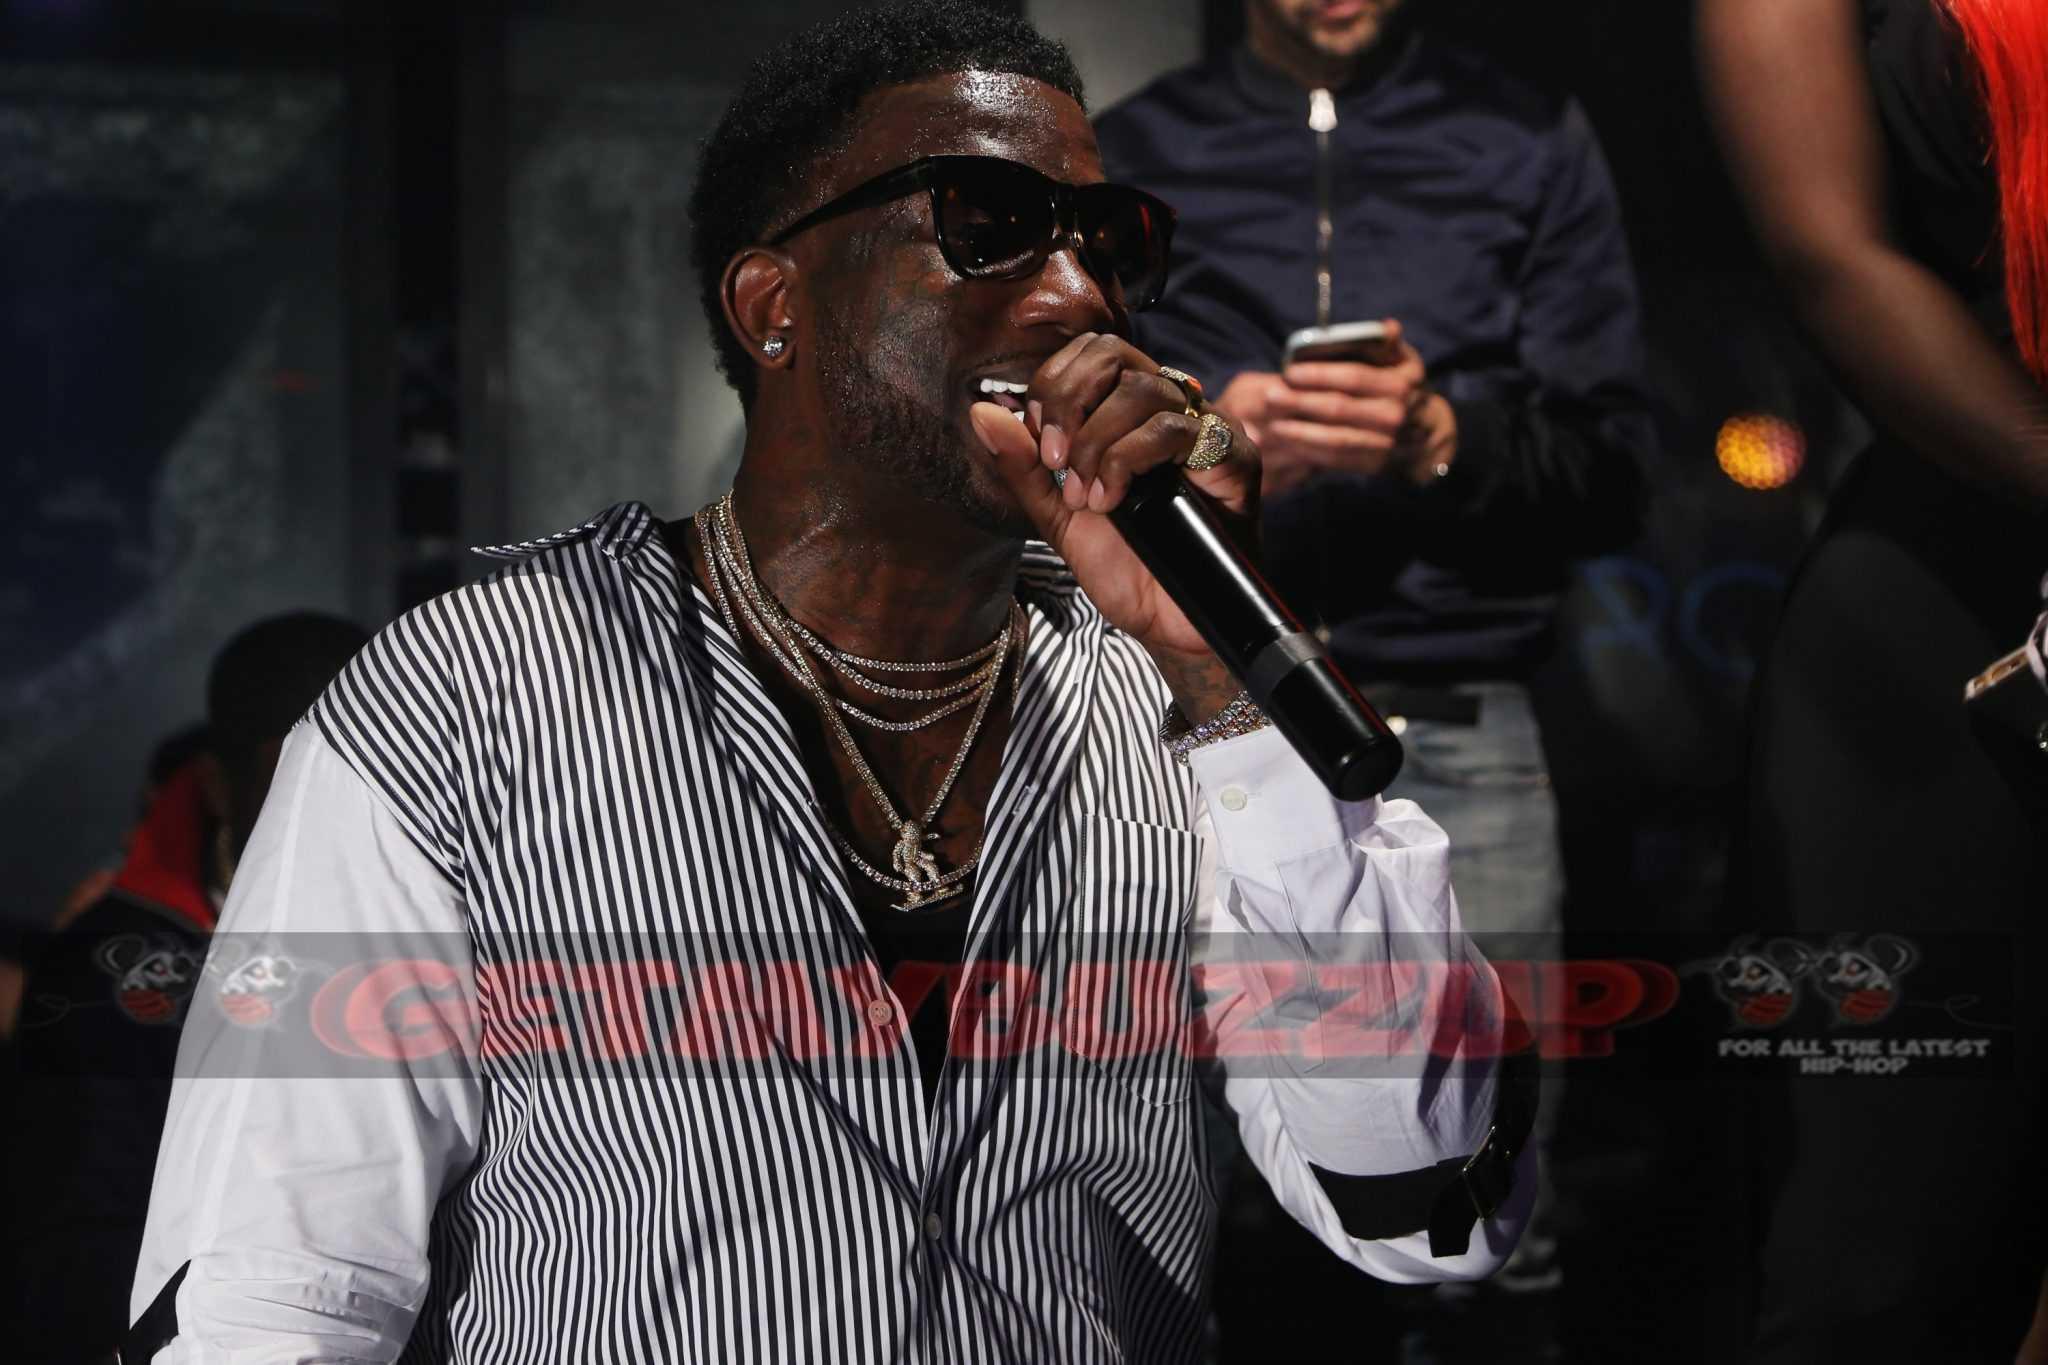 Gucci Mane Performing at 1OAK [Photos]